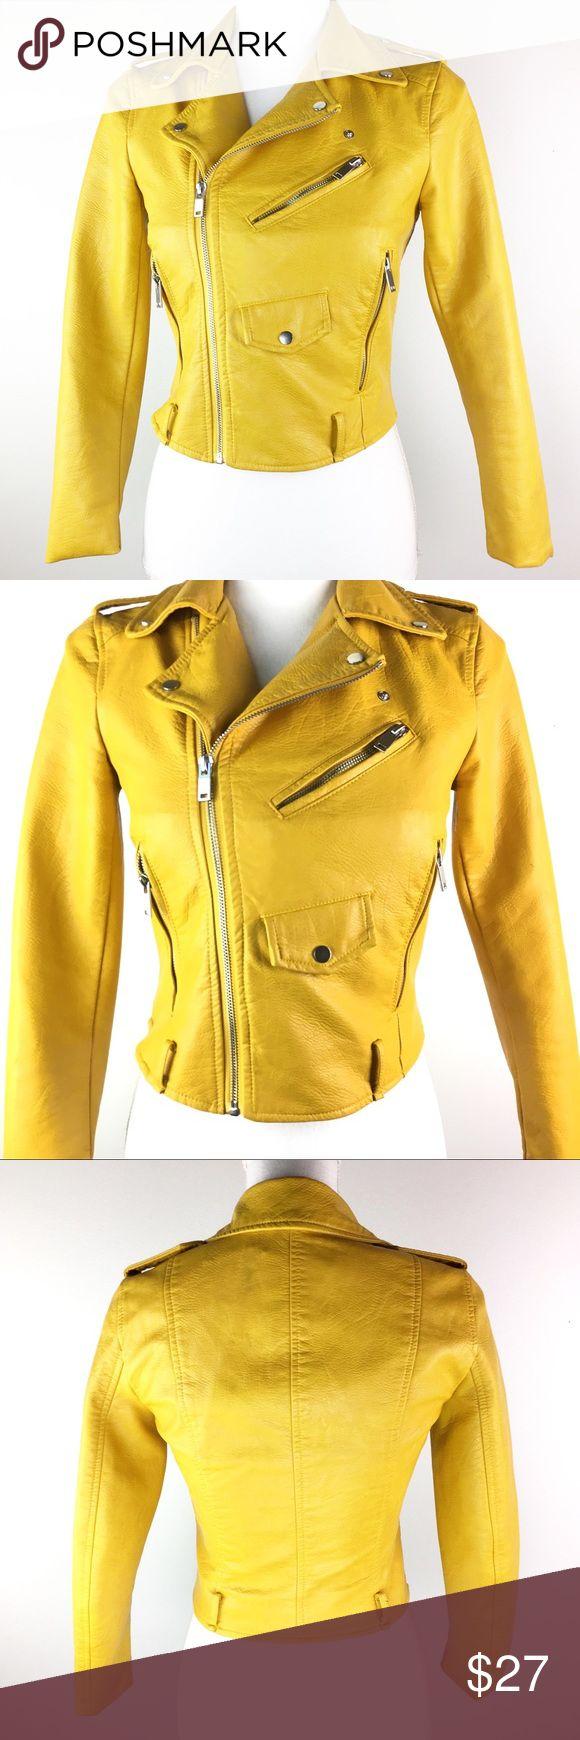 Zara Basic Mustard Yellow Faux Leather Moto Jacket XS This